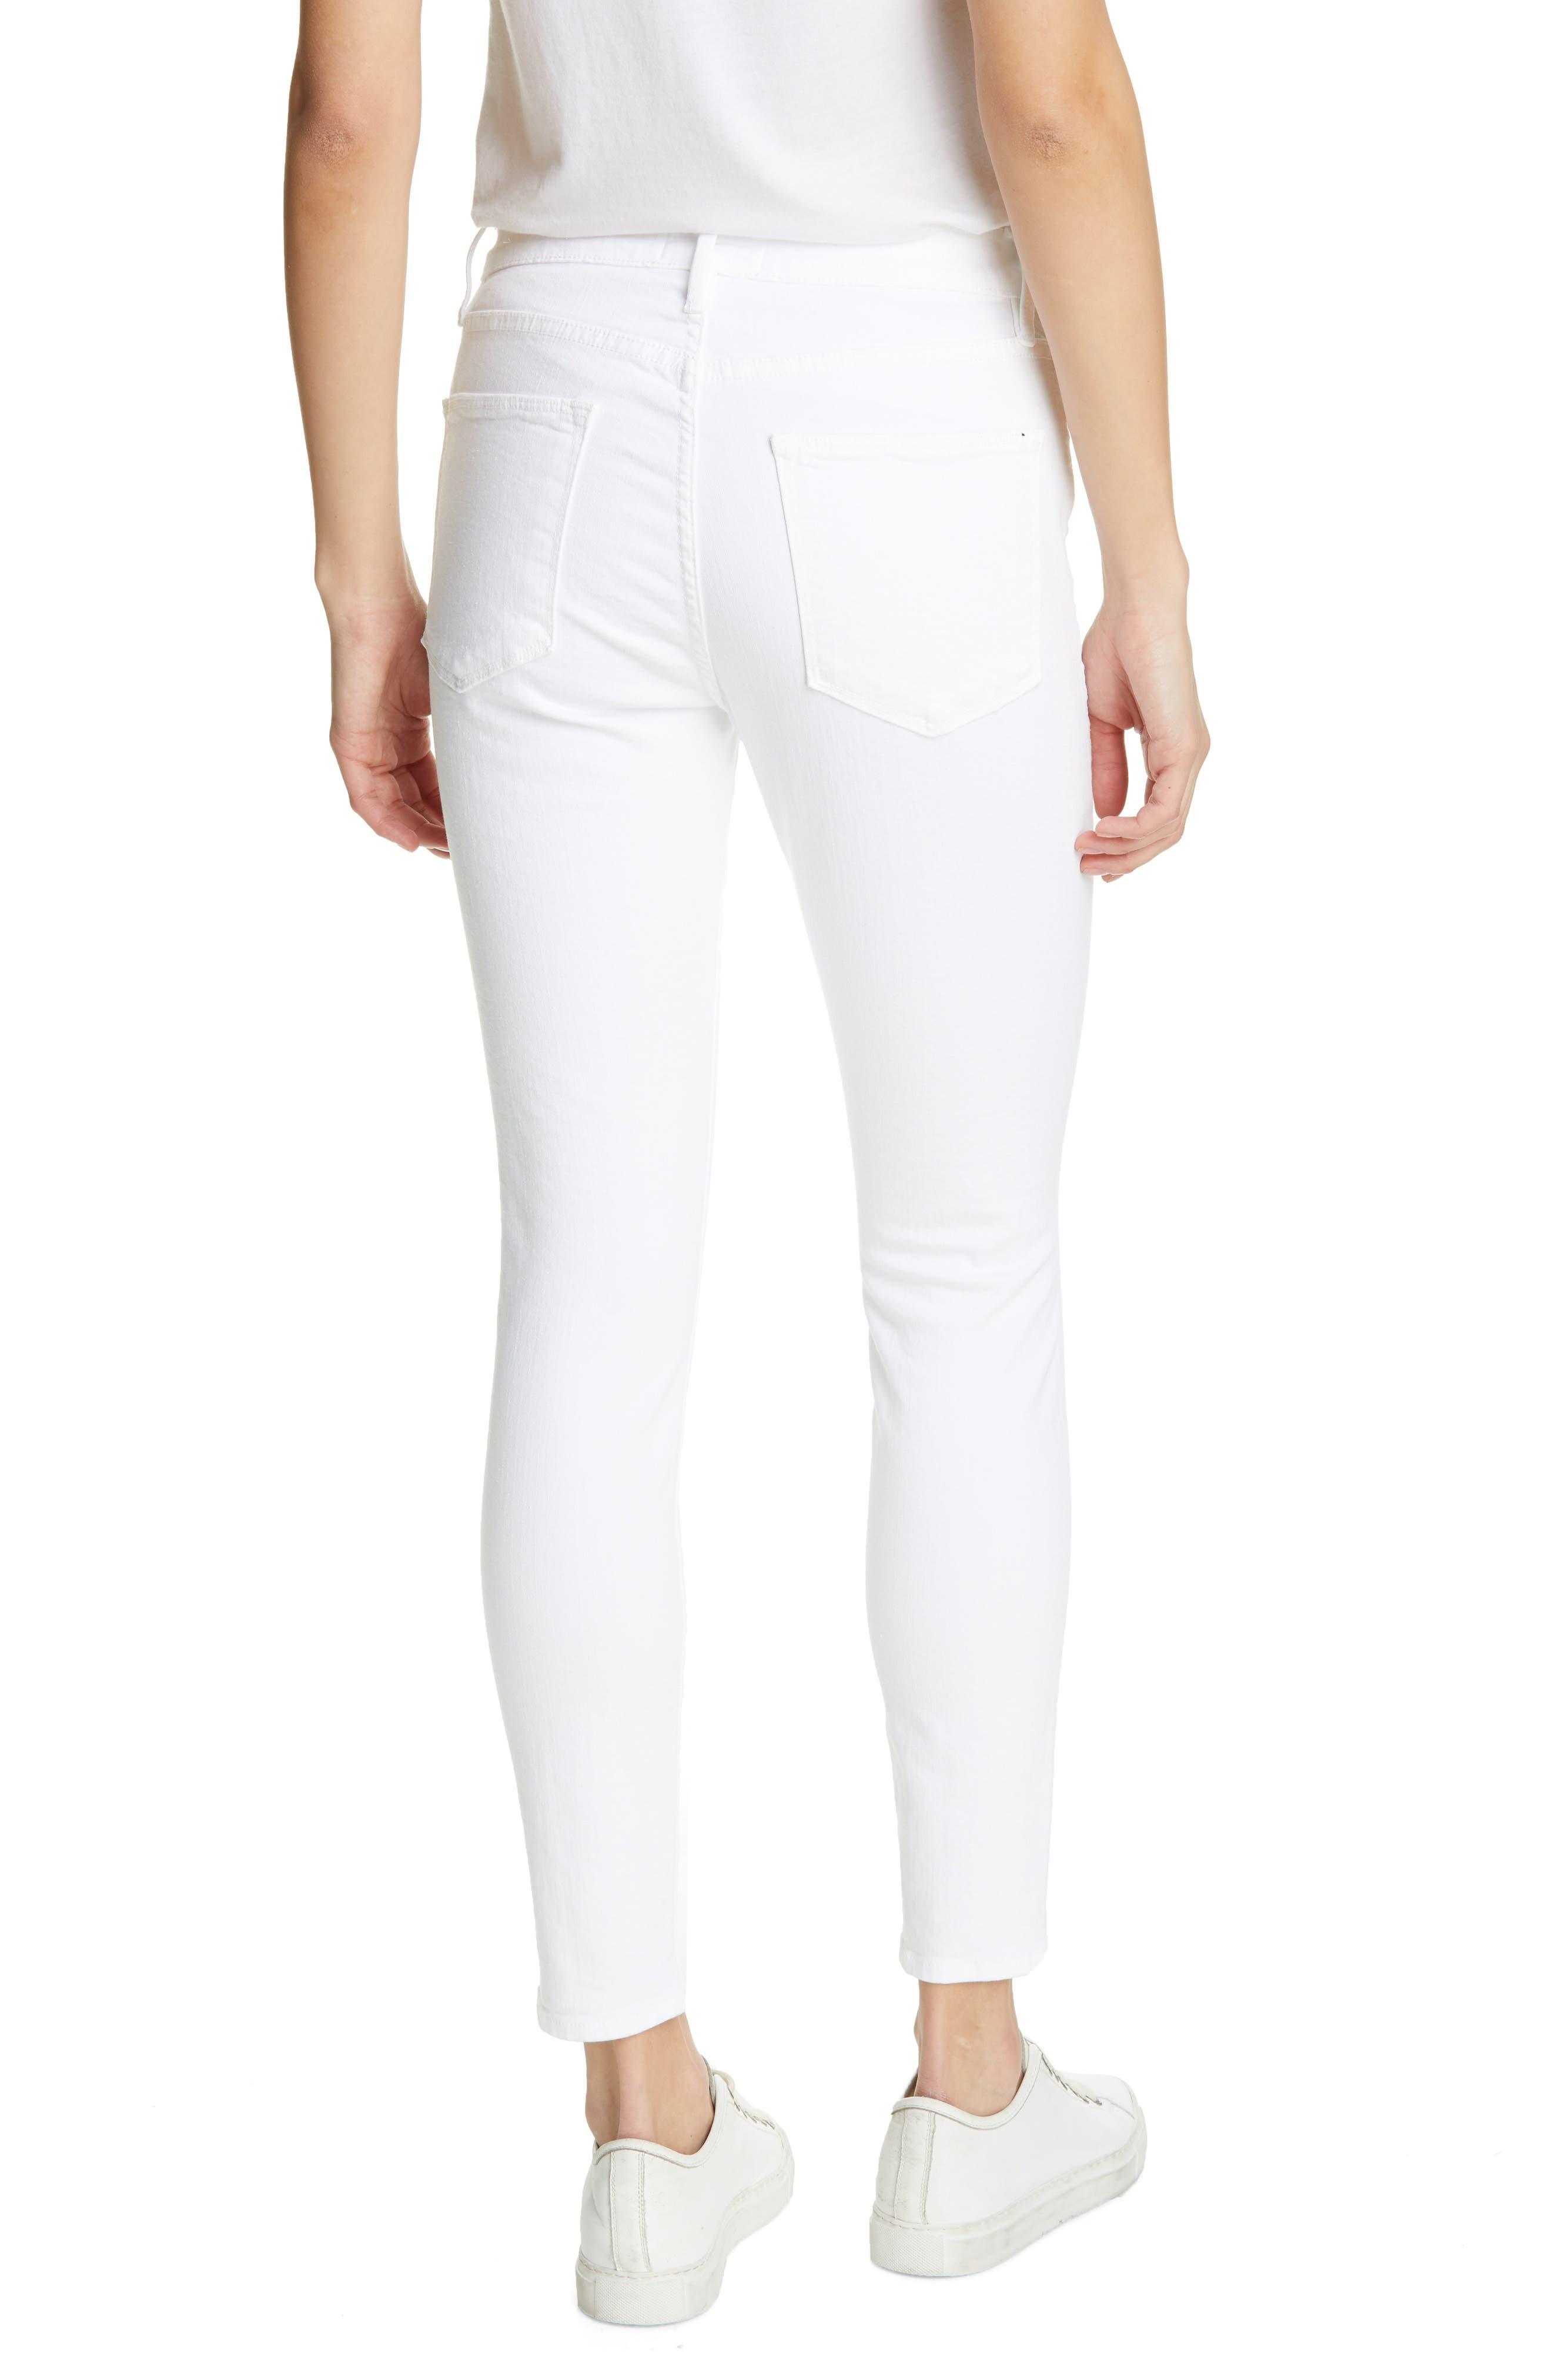 Frame Jeans High Waist Ankle Skinny Jeans